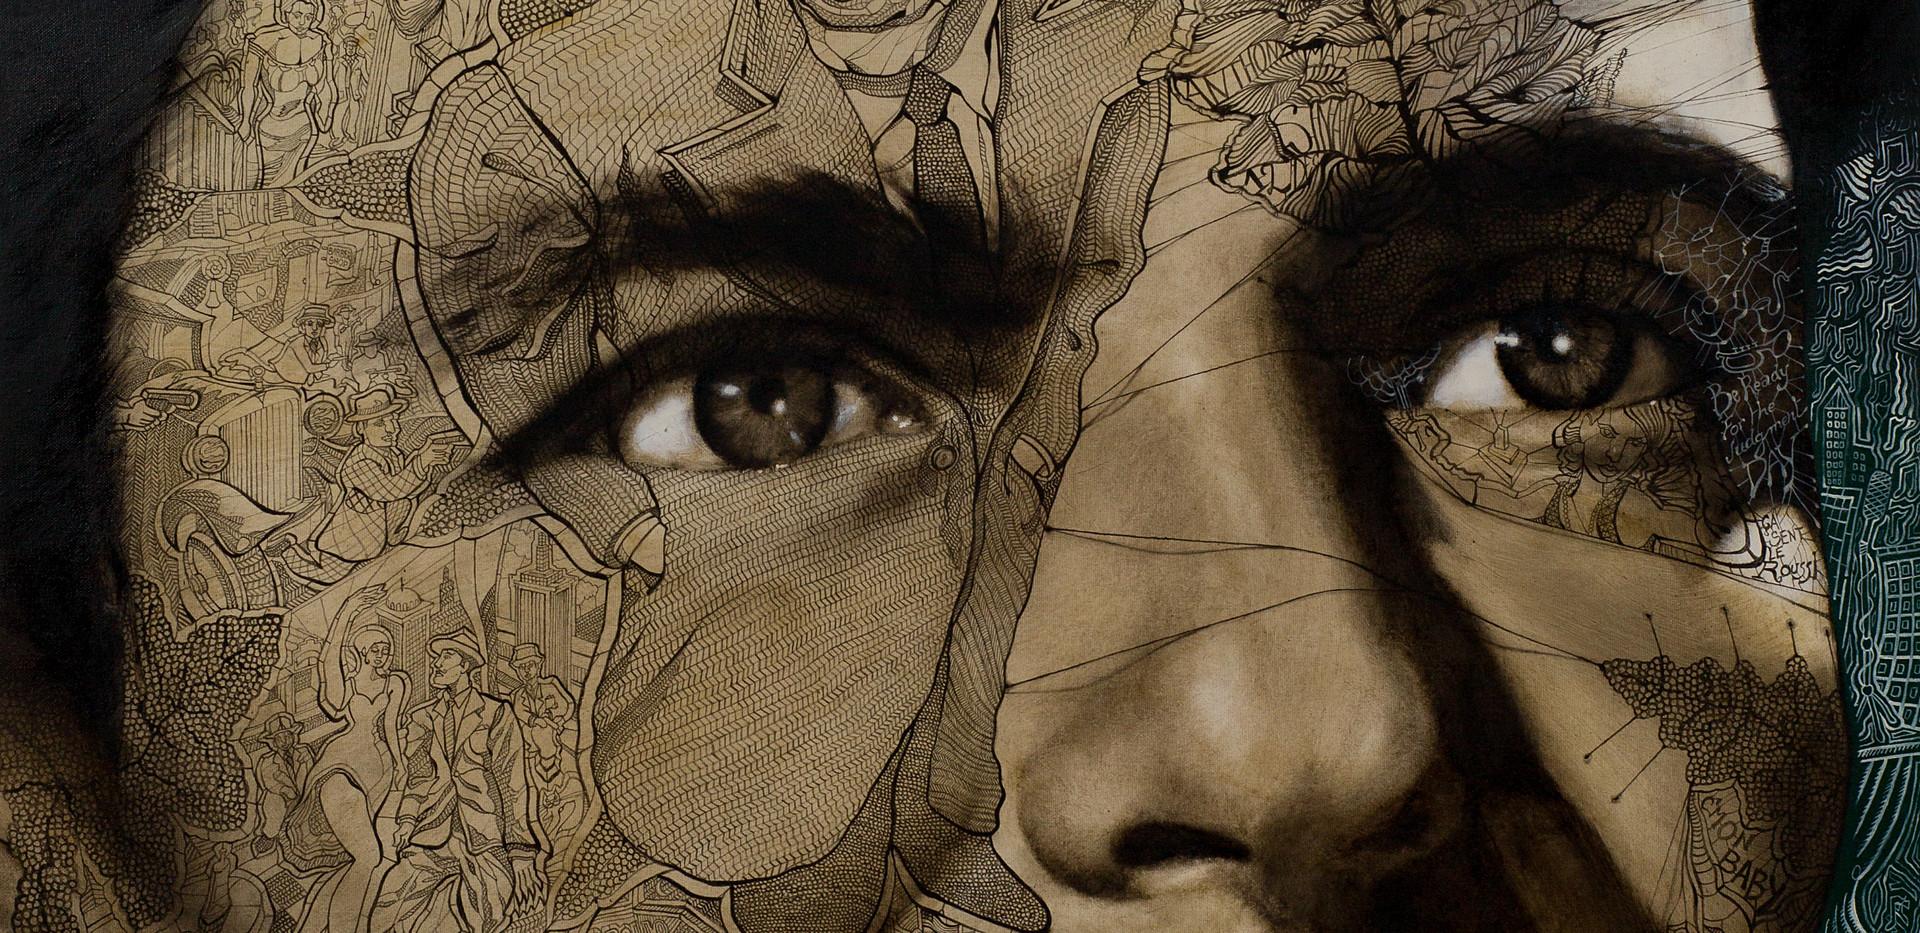 The Voice Of Evil Beauty - Franck